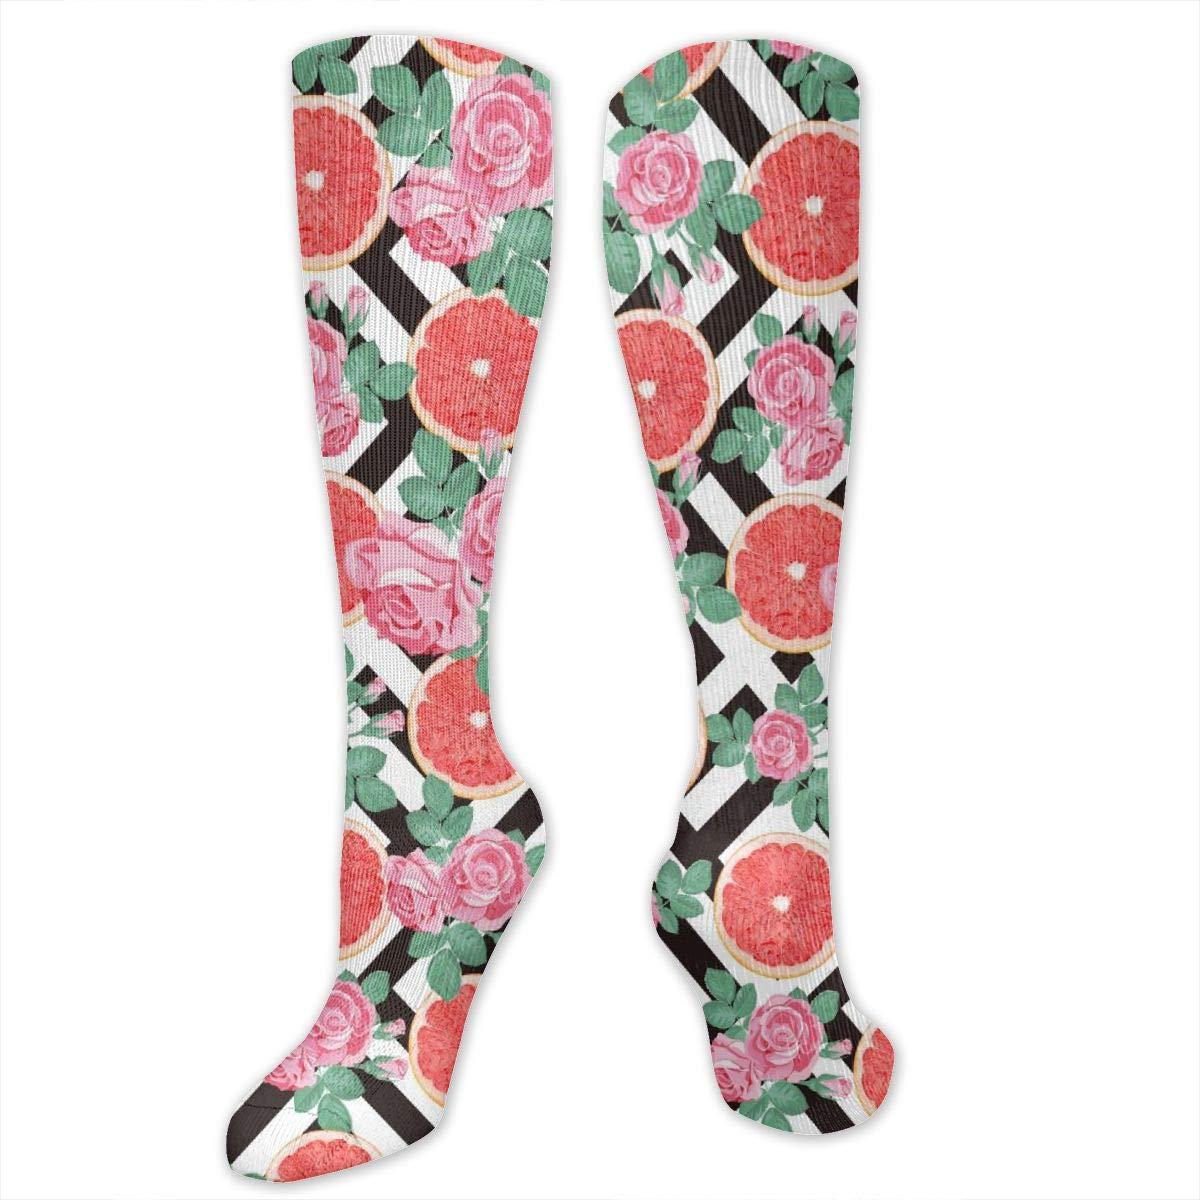 Personalized Grapefruit Socks Long Knee High Boot Socks